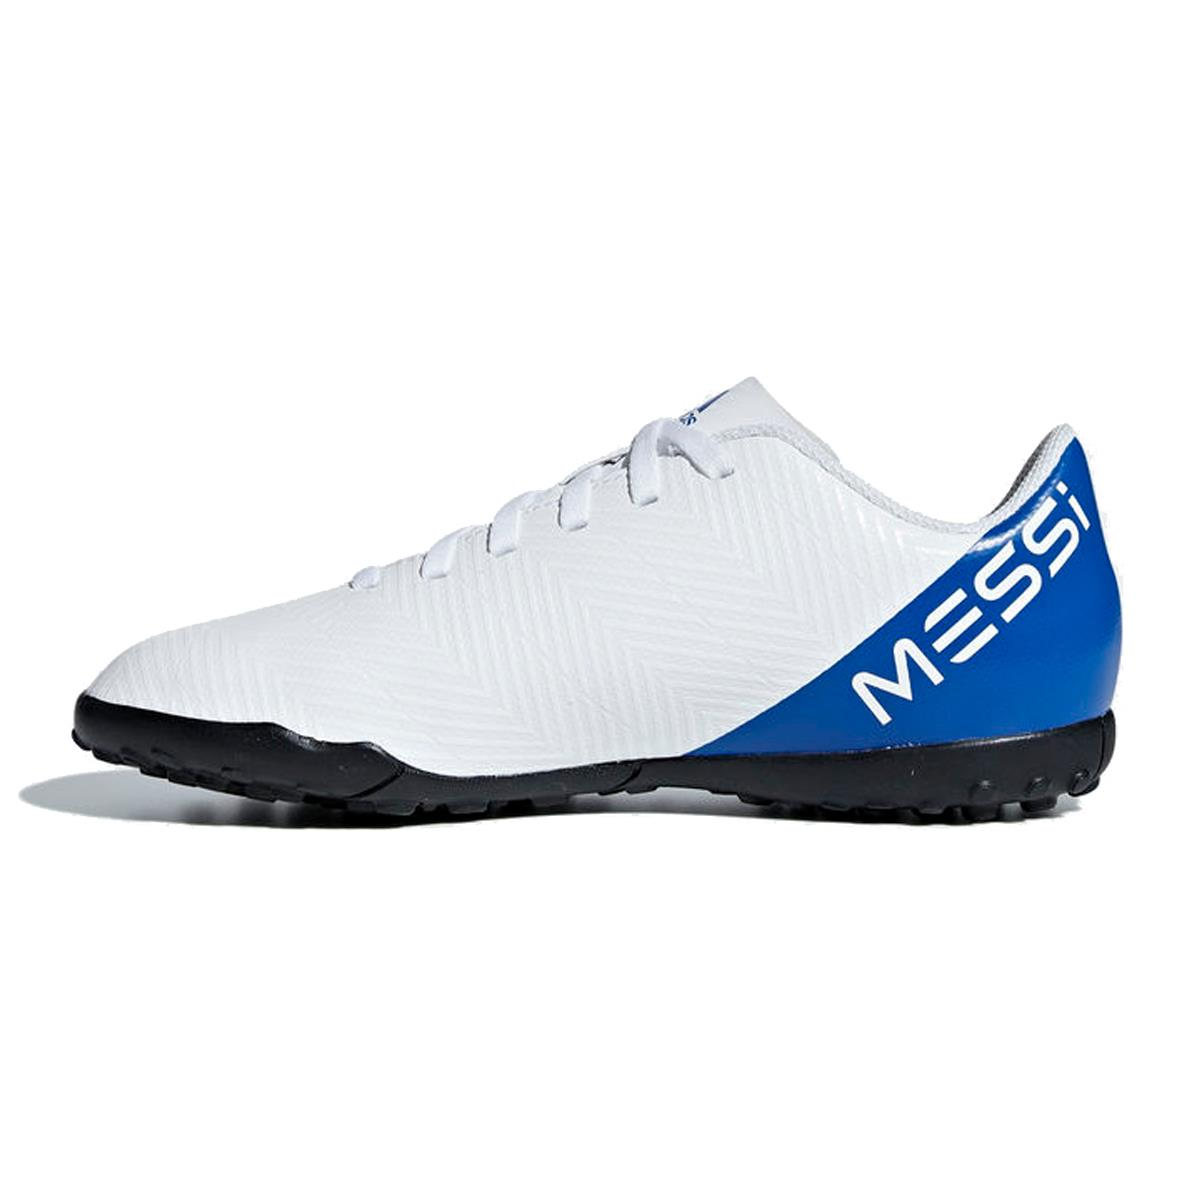 chuteira-society-adidas-nemeziz-messi-tango-18-4-infantil-branco-e-azul b537d168445bf